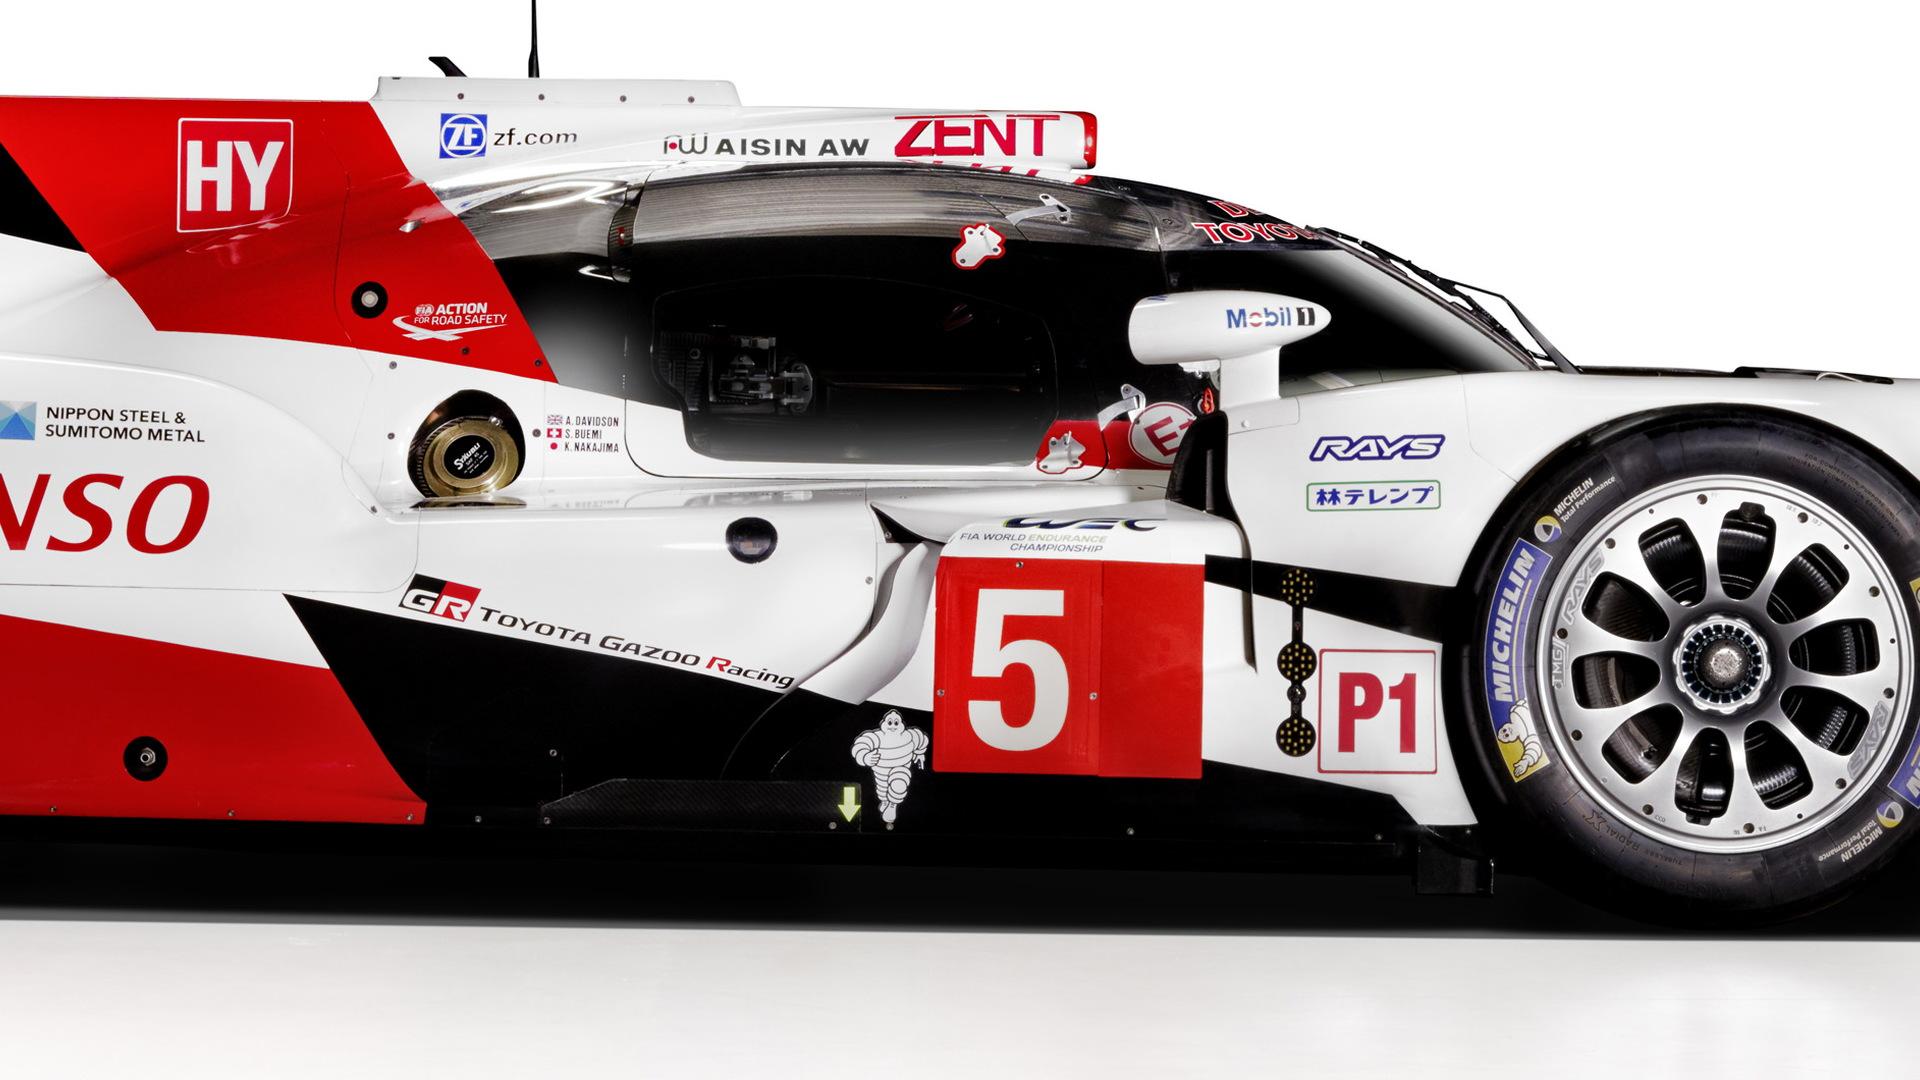 2016 Toyota TS050 Hybrid LMP1 race car